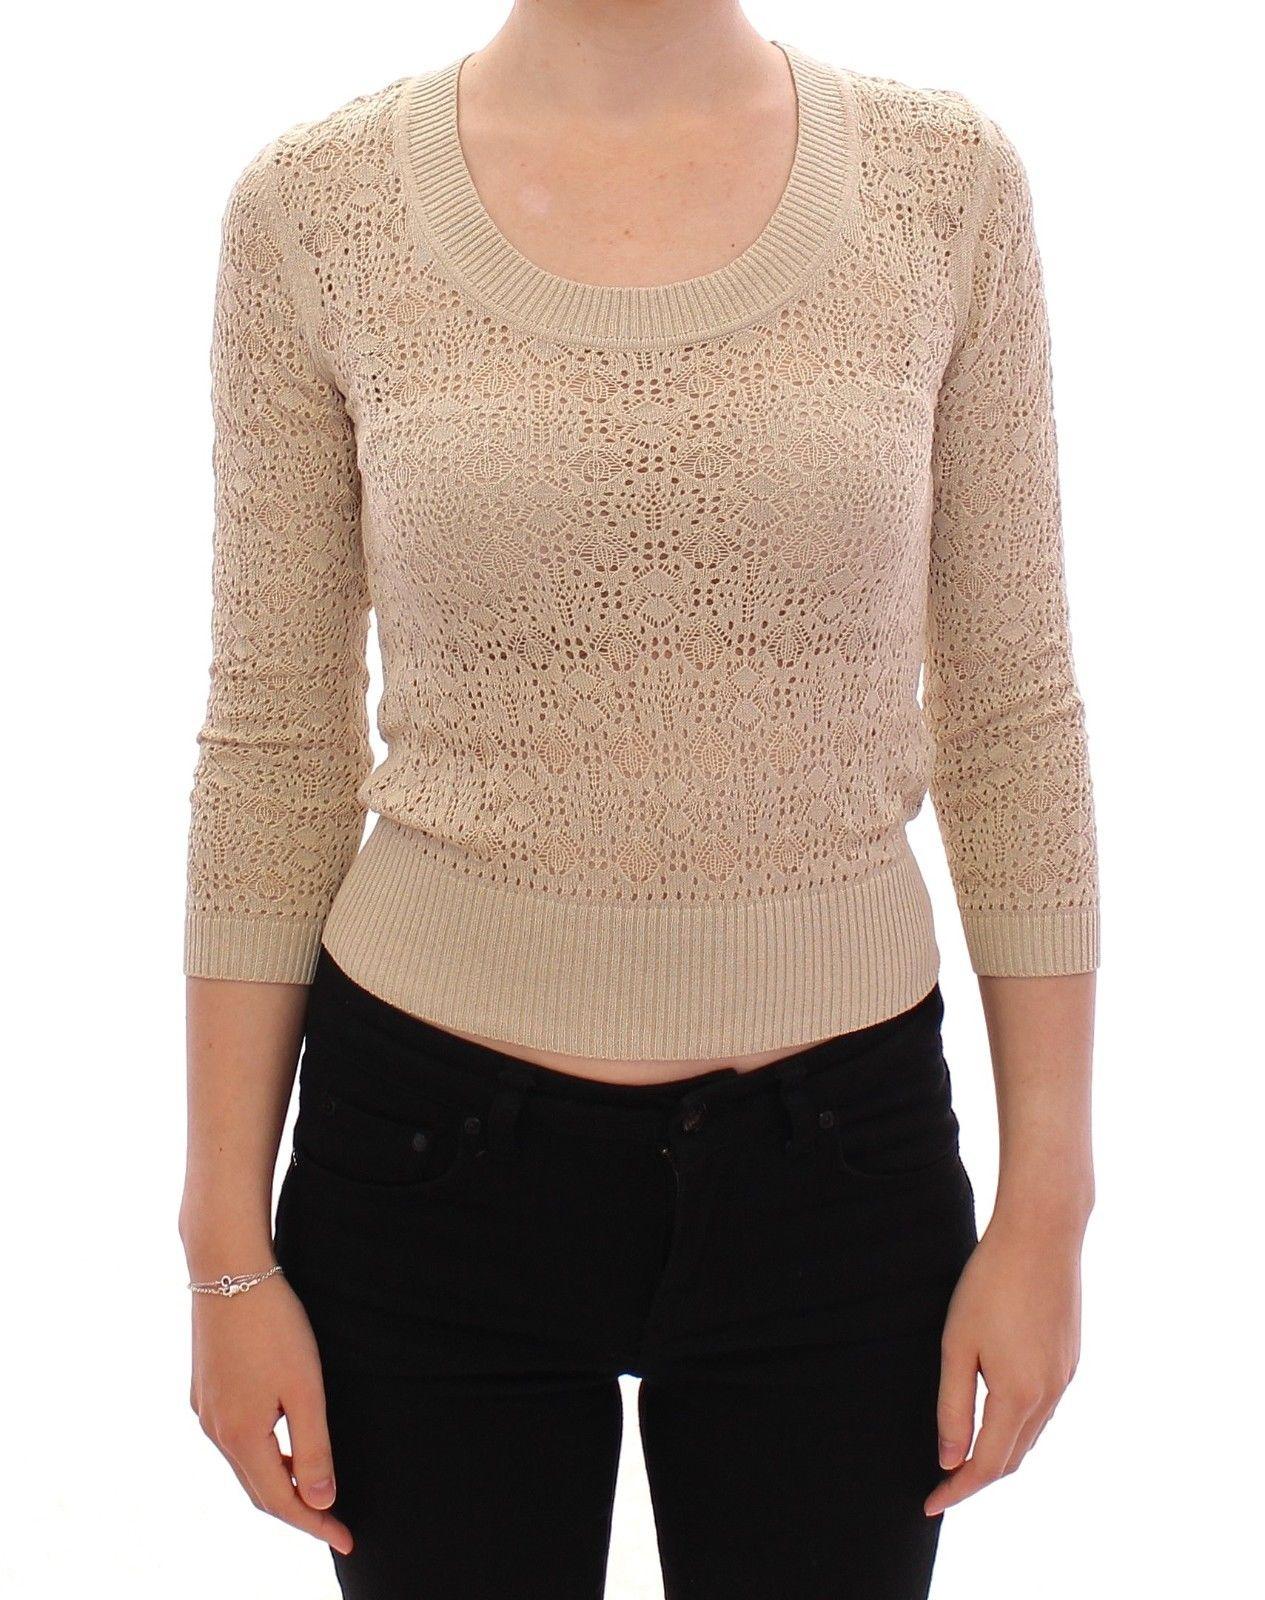 Dolce & Gabbana Women's Knitted Deep Crewneck Sweater Beige MOM11169 - S